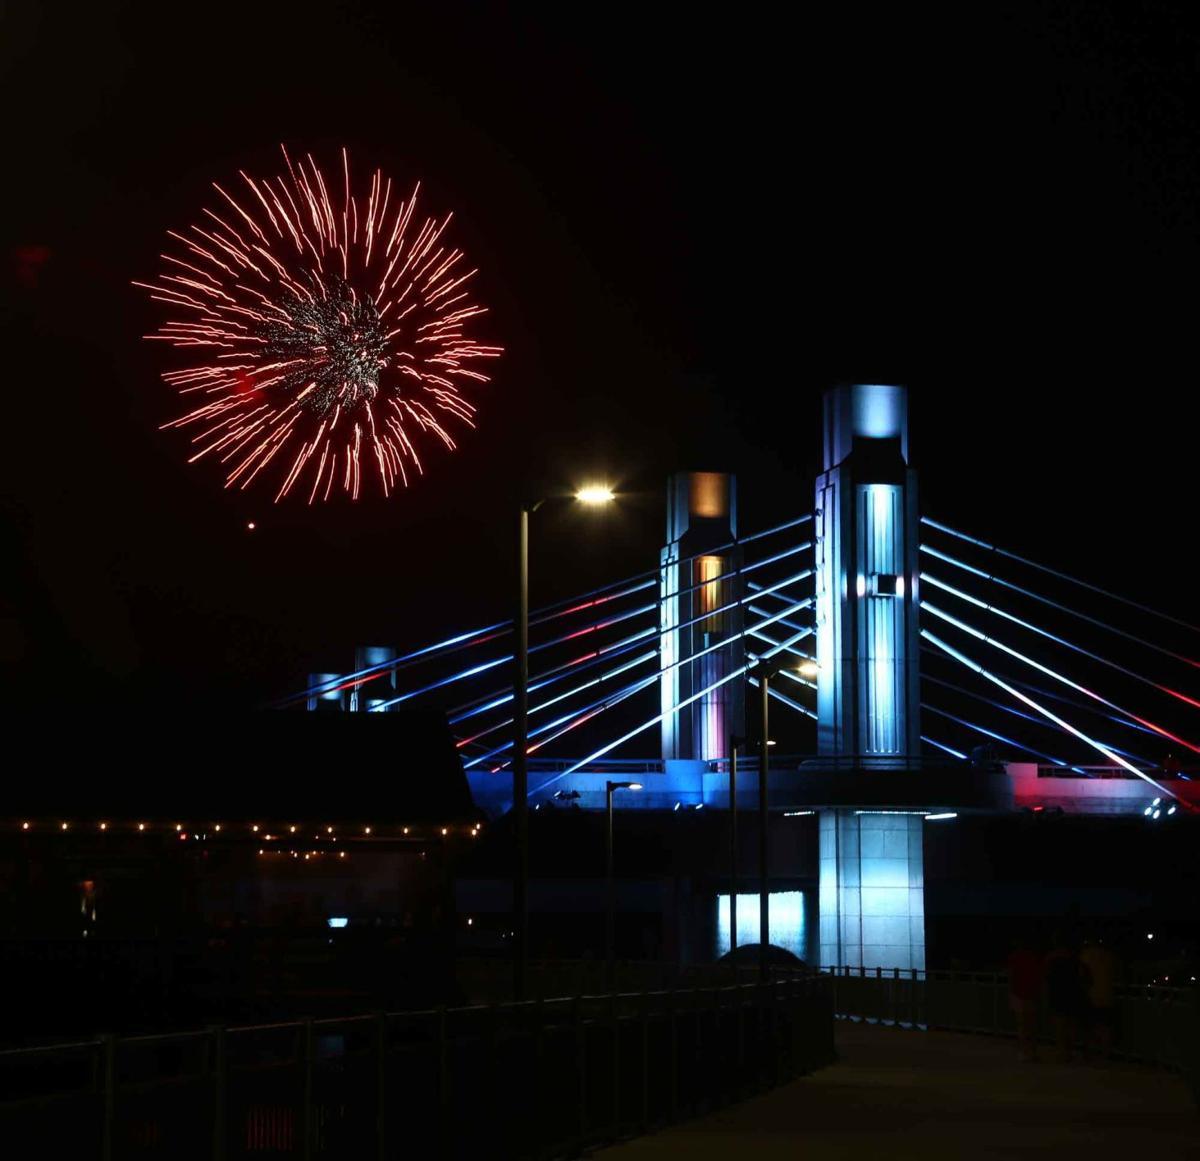 July 4th fireworks (copy)